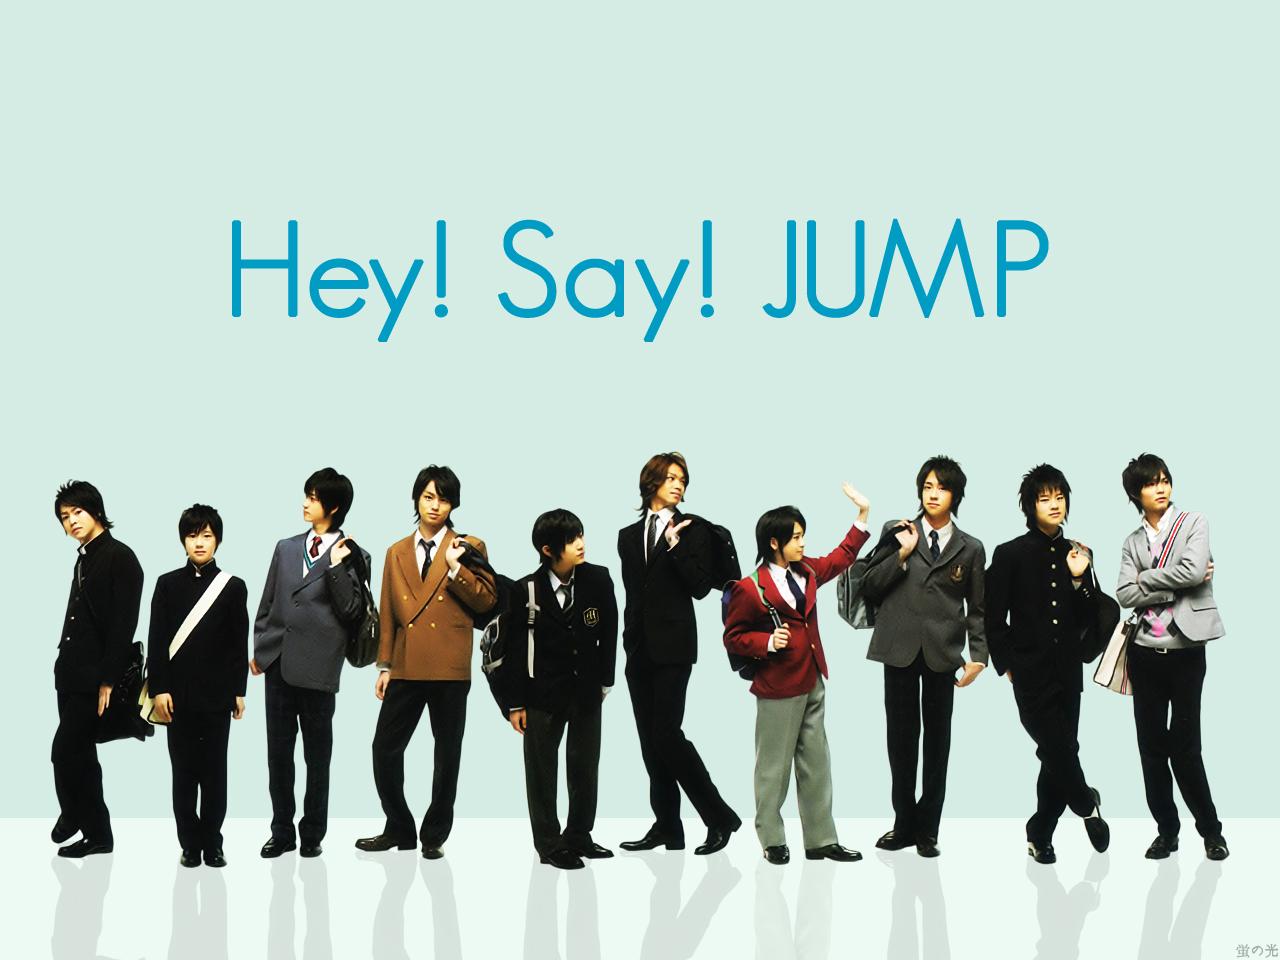 Hey Say Jumpの画像 原寸画像検索